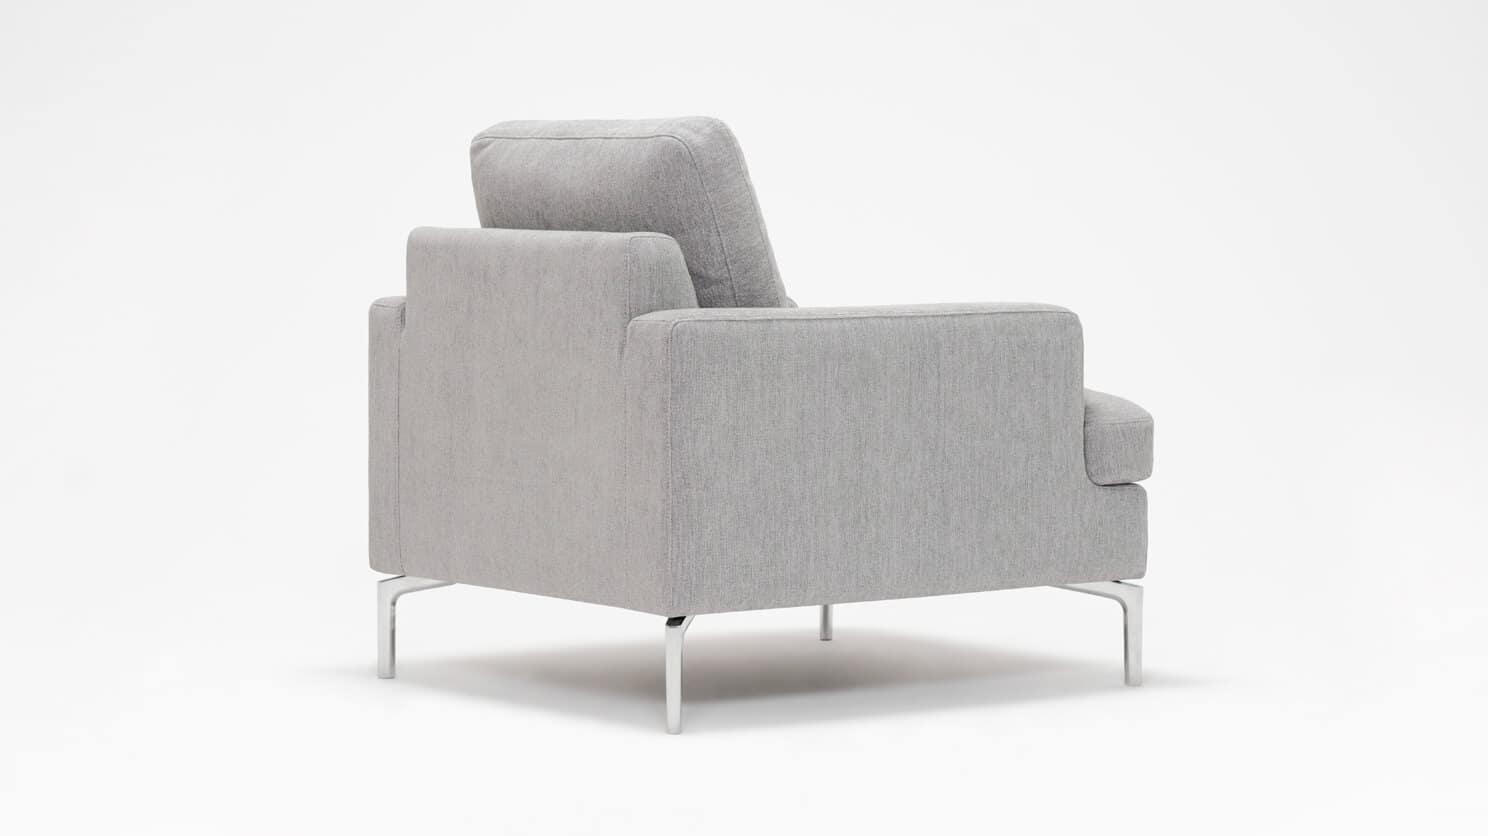 31127 02 6 chairs eve chair coda concrete back corner 01